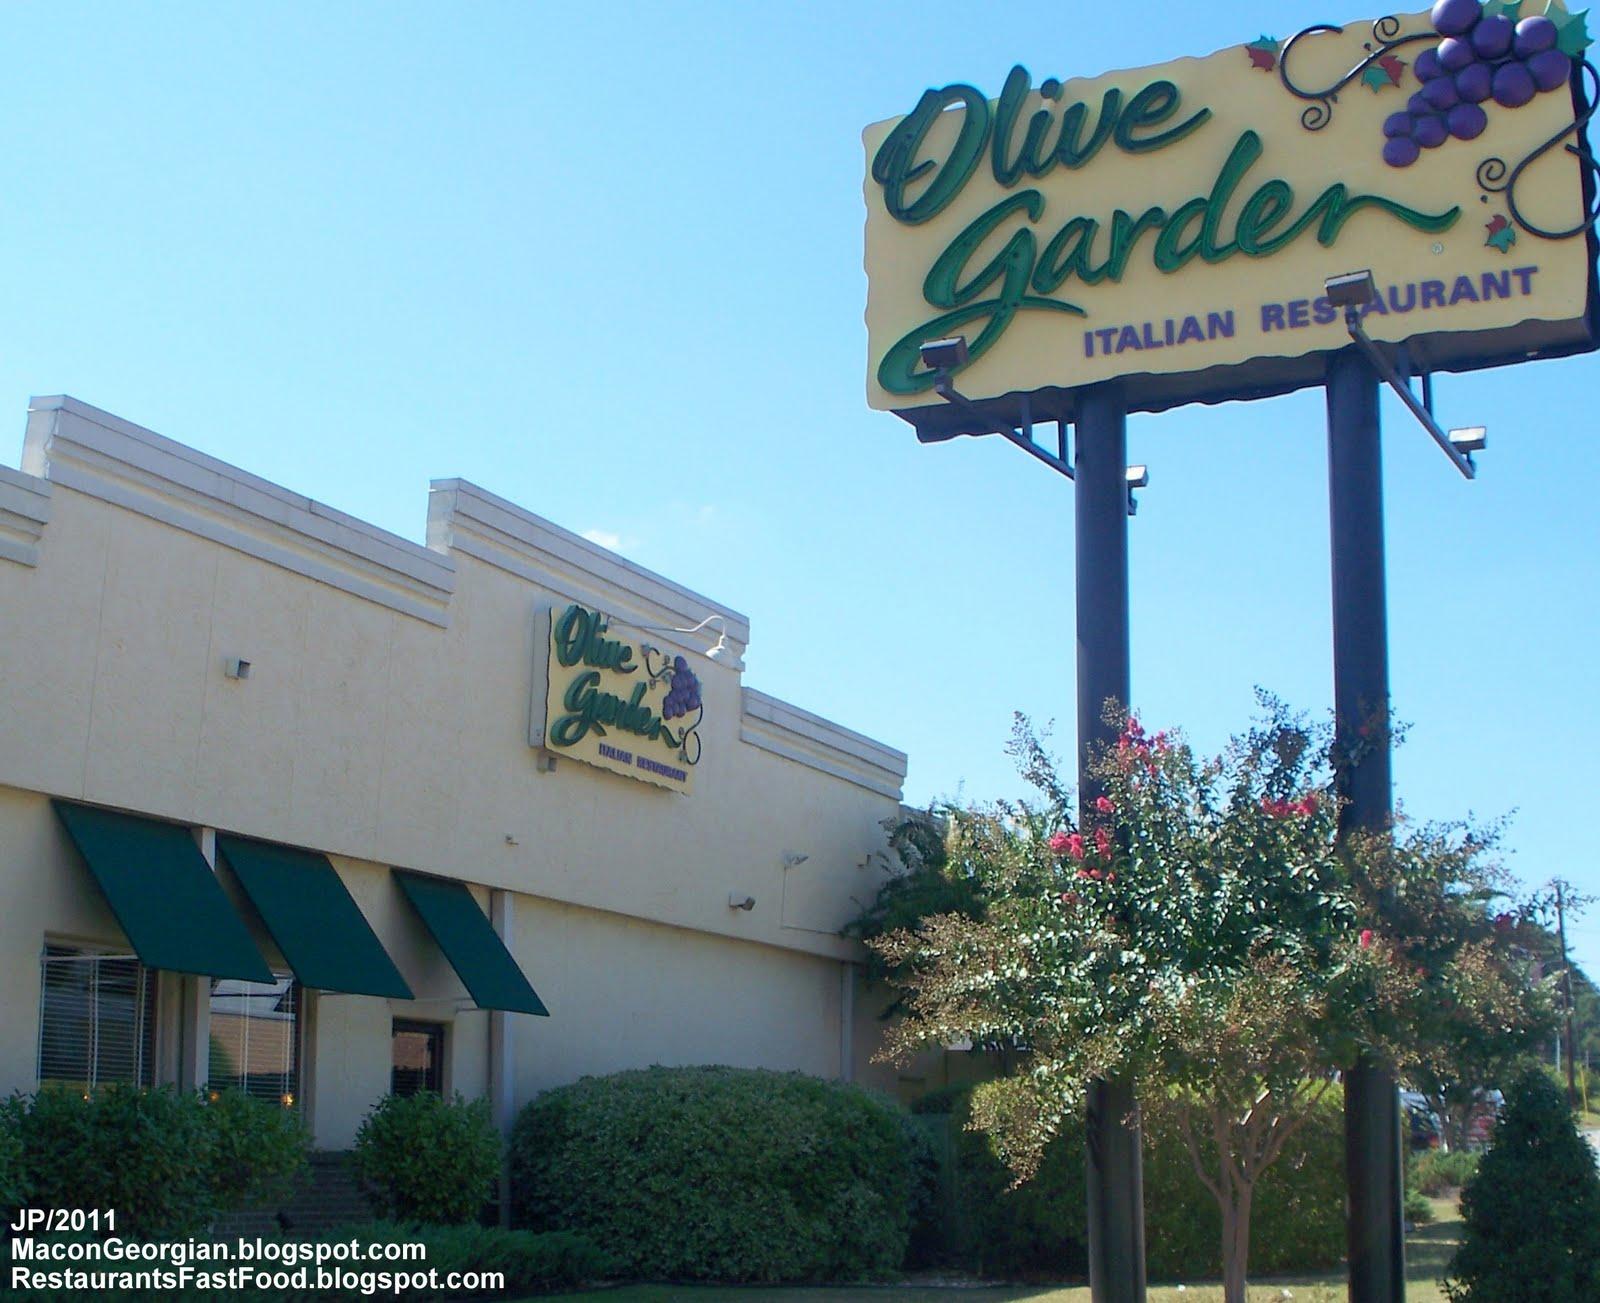 olive garden macon georgia olive garden italian food restaurant macon ga bloomfield road pasta salad lunch menu - Olive Garden Orland Park